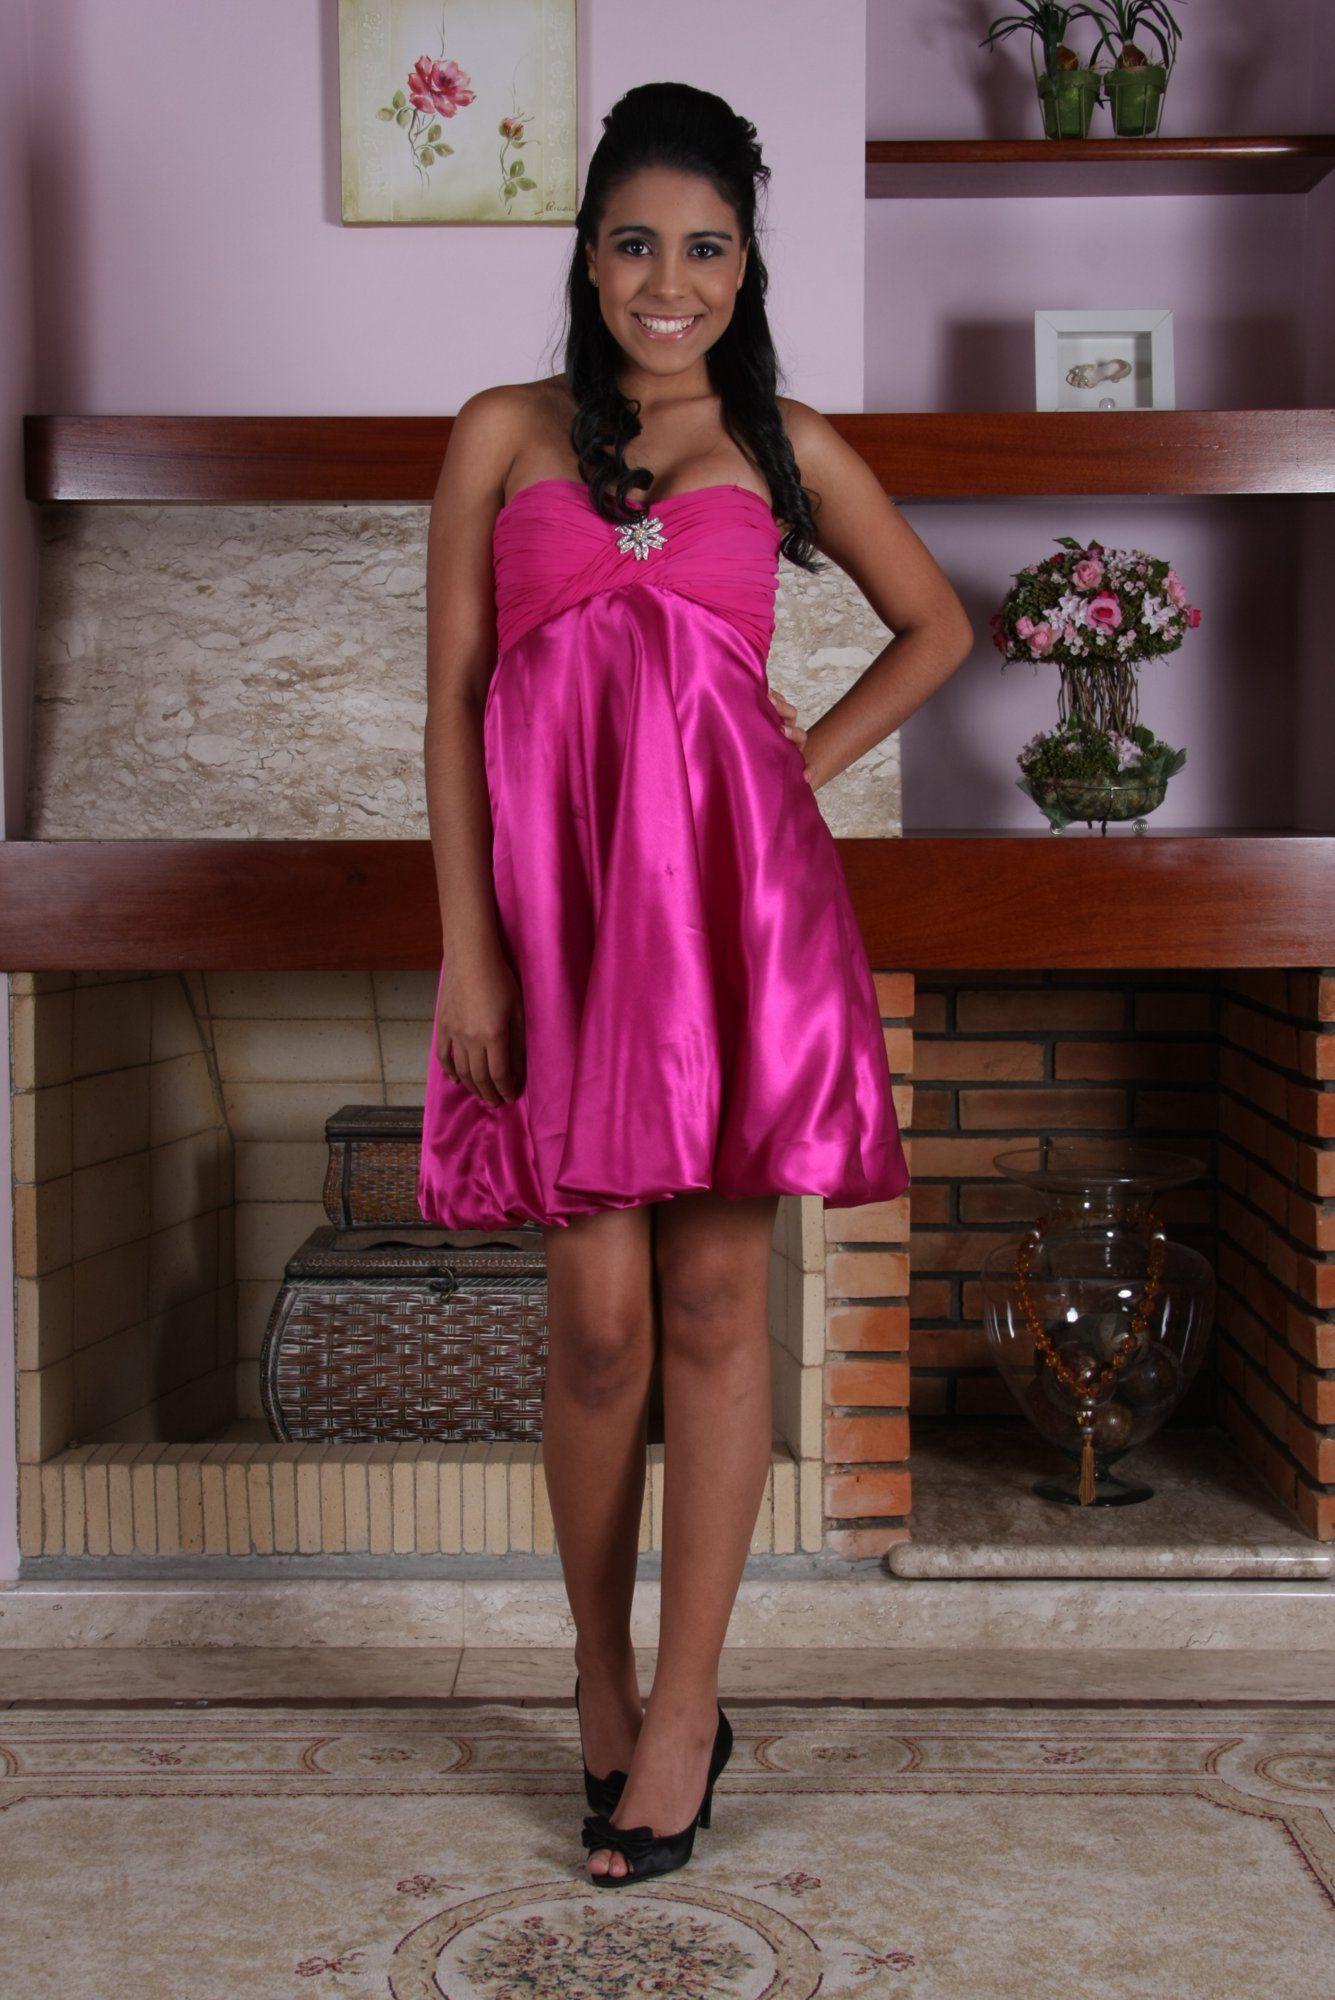 Vestido de Debutante Pink - 14 - Hipnose Alta Costura e Spa para Noivas e Noivos - Campinas - SP Vestido de Debutante, Vestido de Debutante Pink, Hipnose Alta Costura